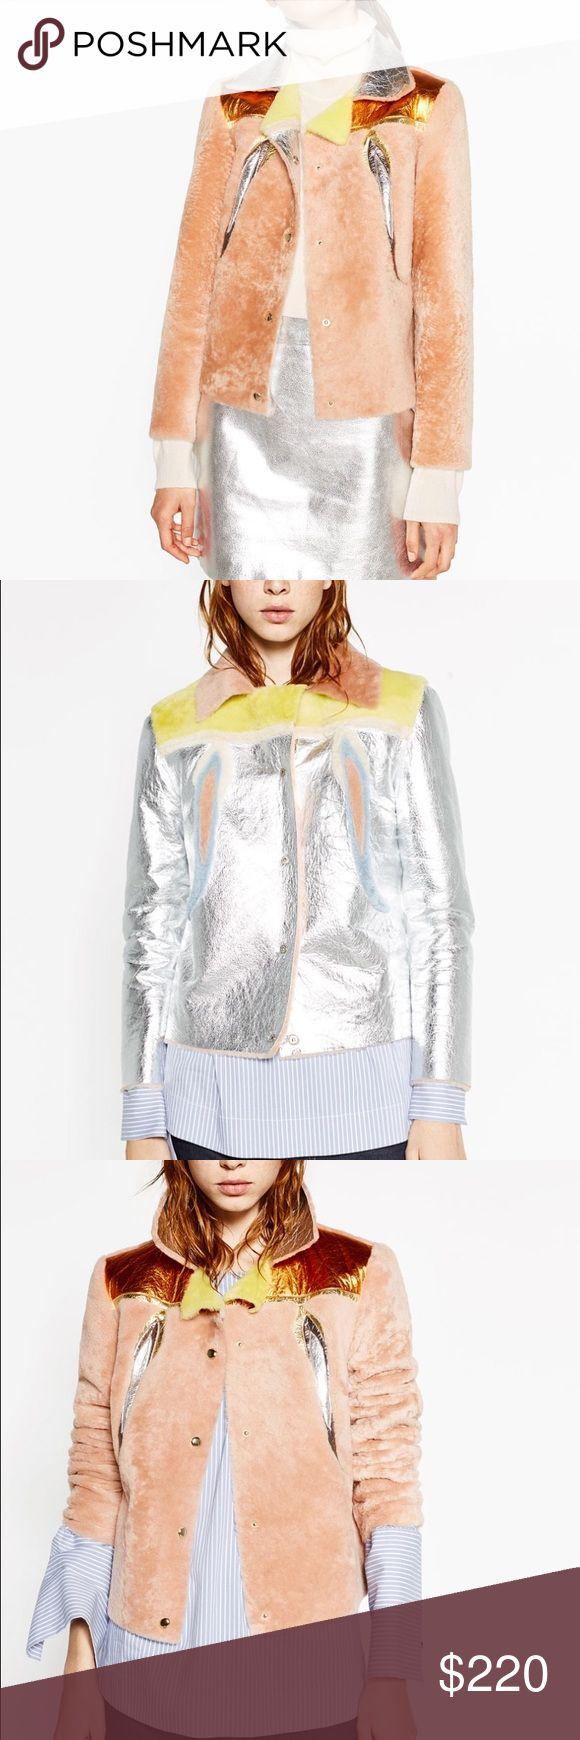 Zara multicolor faux fur reversible jacket NWT Zara multicolor faux fur reversible jacket NWT Zara Jackets & Coats